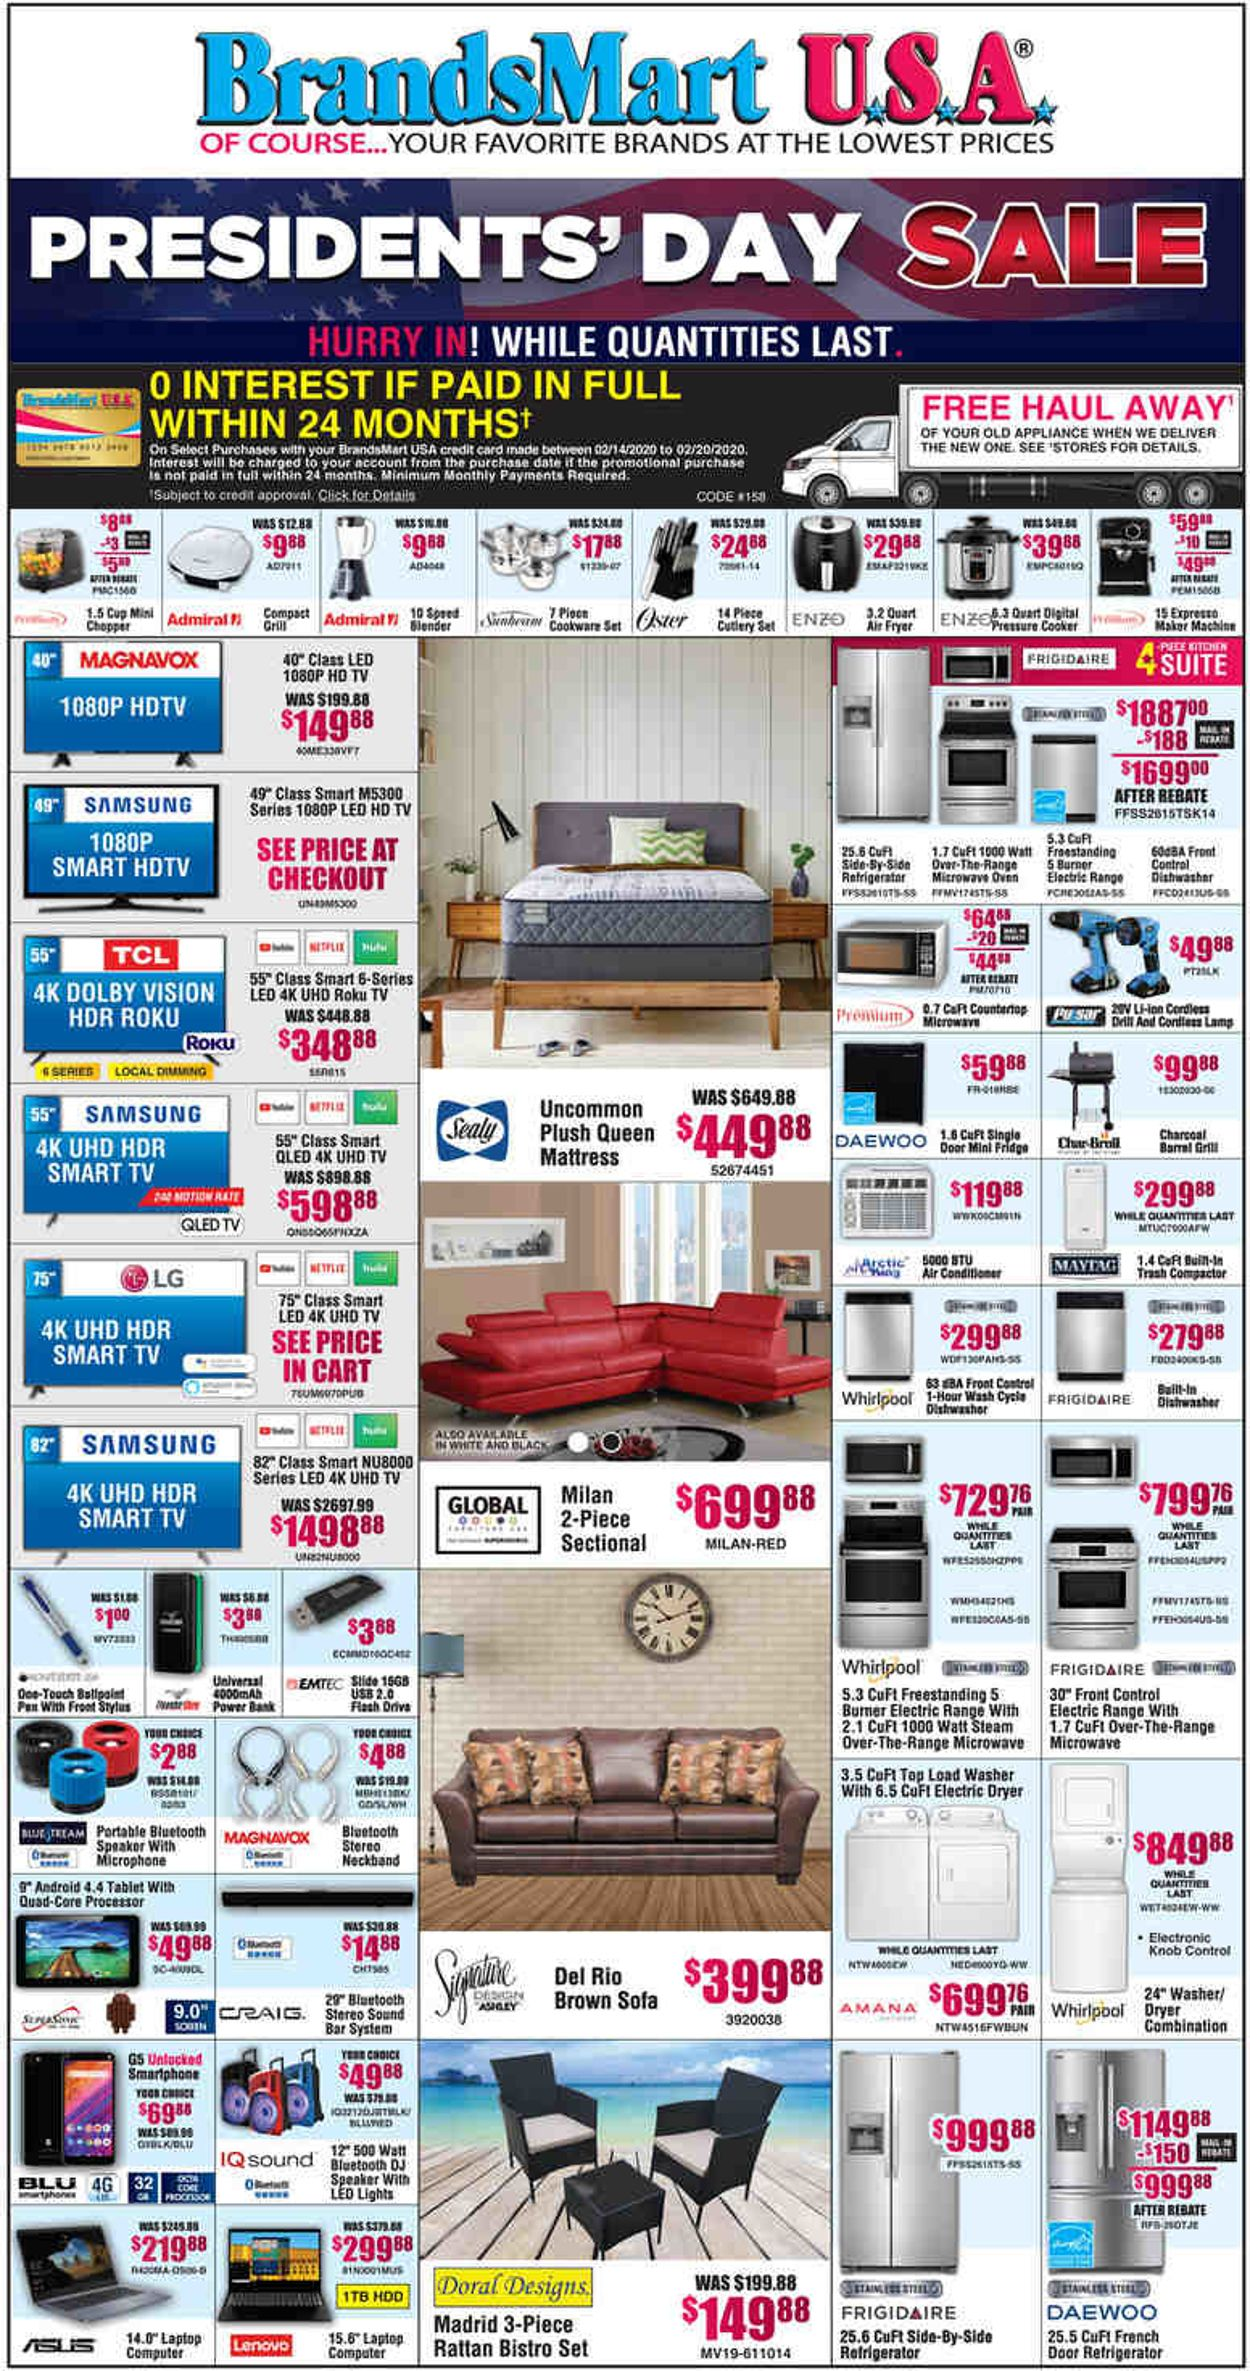 Brandsmart USA Weekly Ad Circular - valid 02/14-02/16/2020